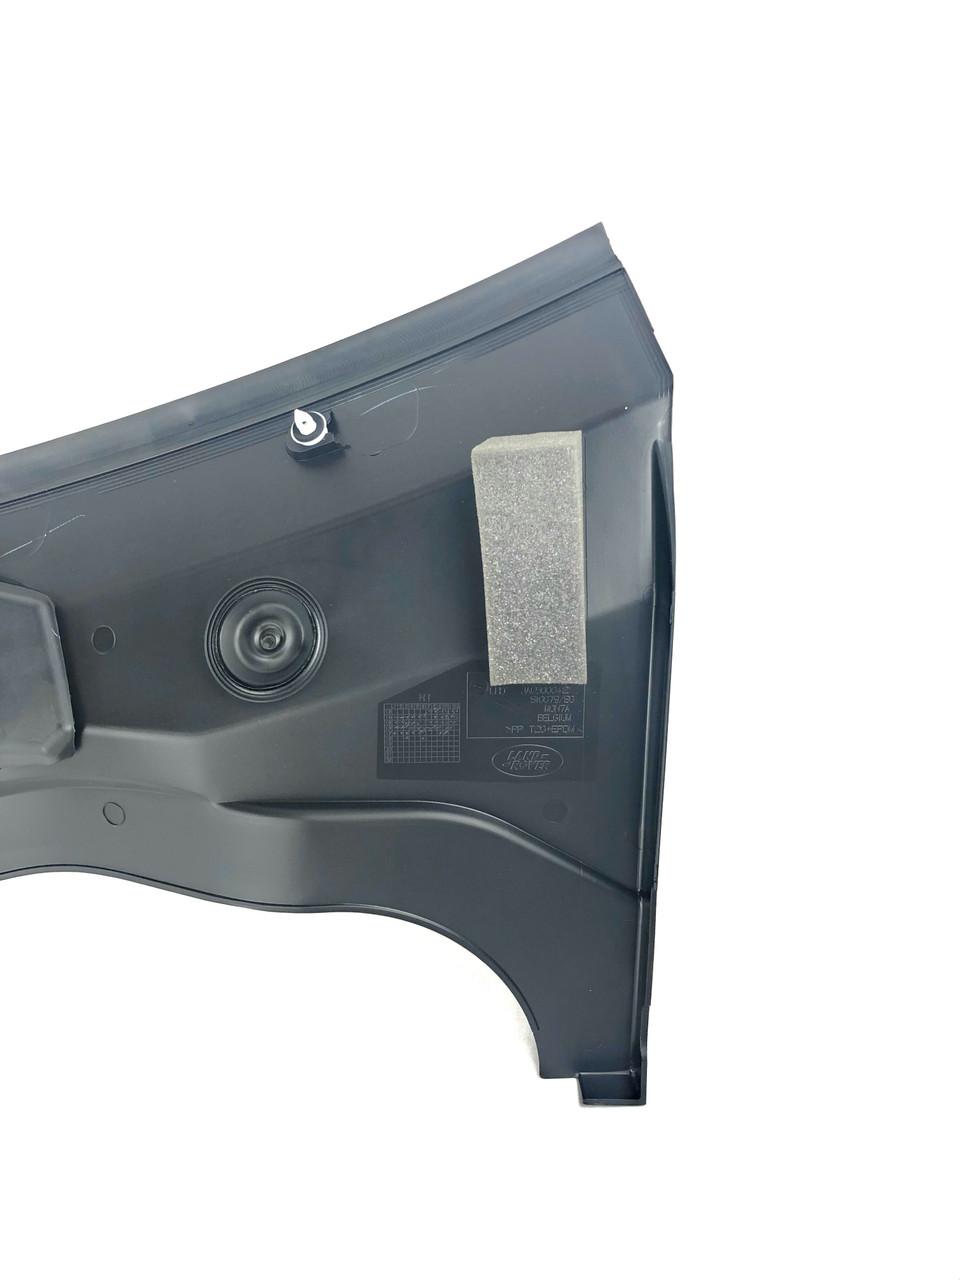 Cowl Panel - LR096164